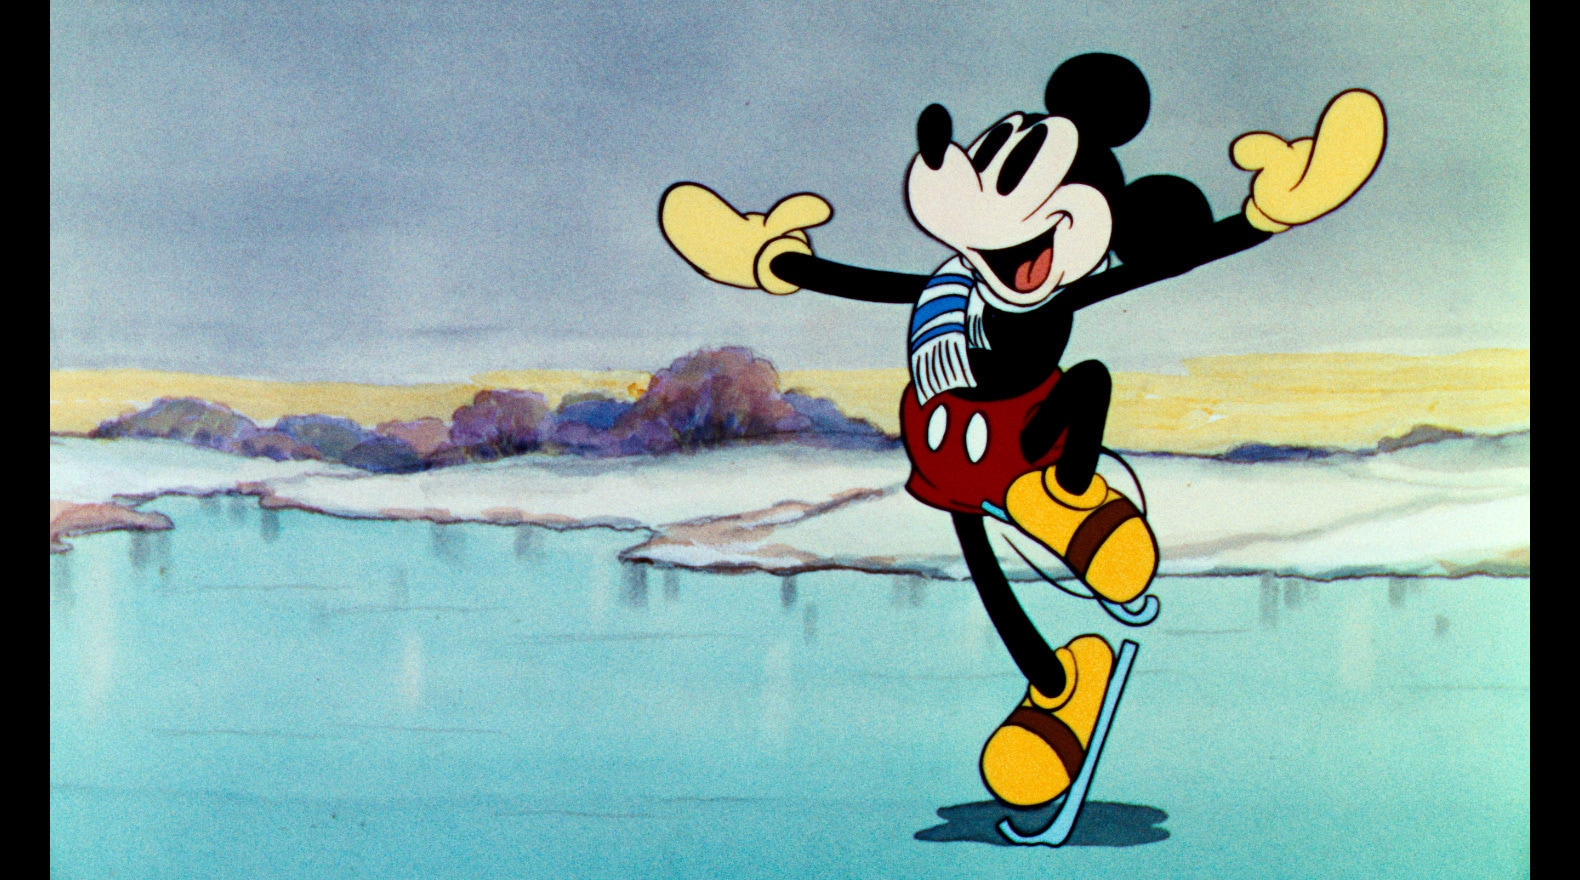 Mickey tries to impress Minnie with his skating skills.